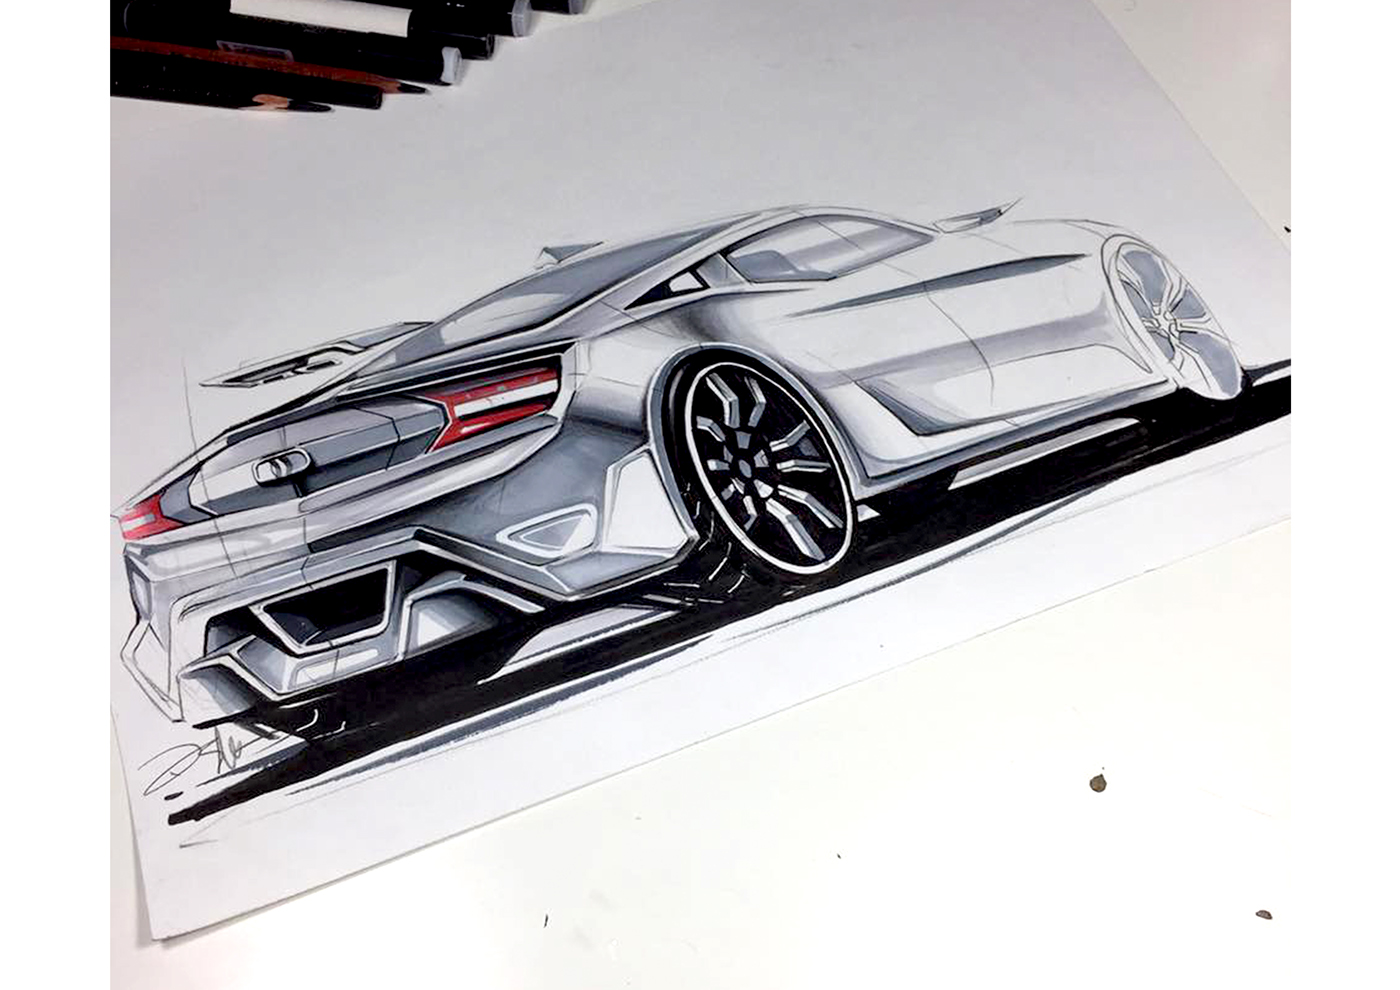 Concept Car Design, Sketch Rendering